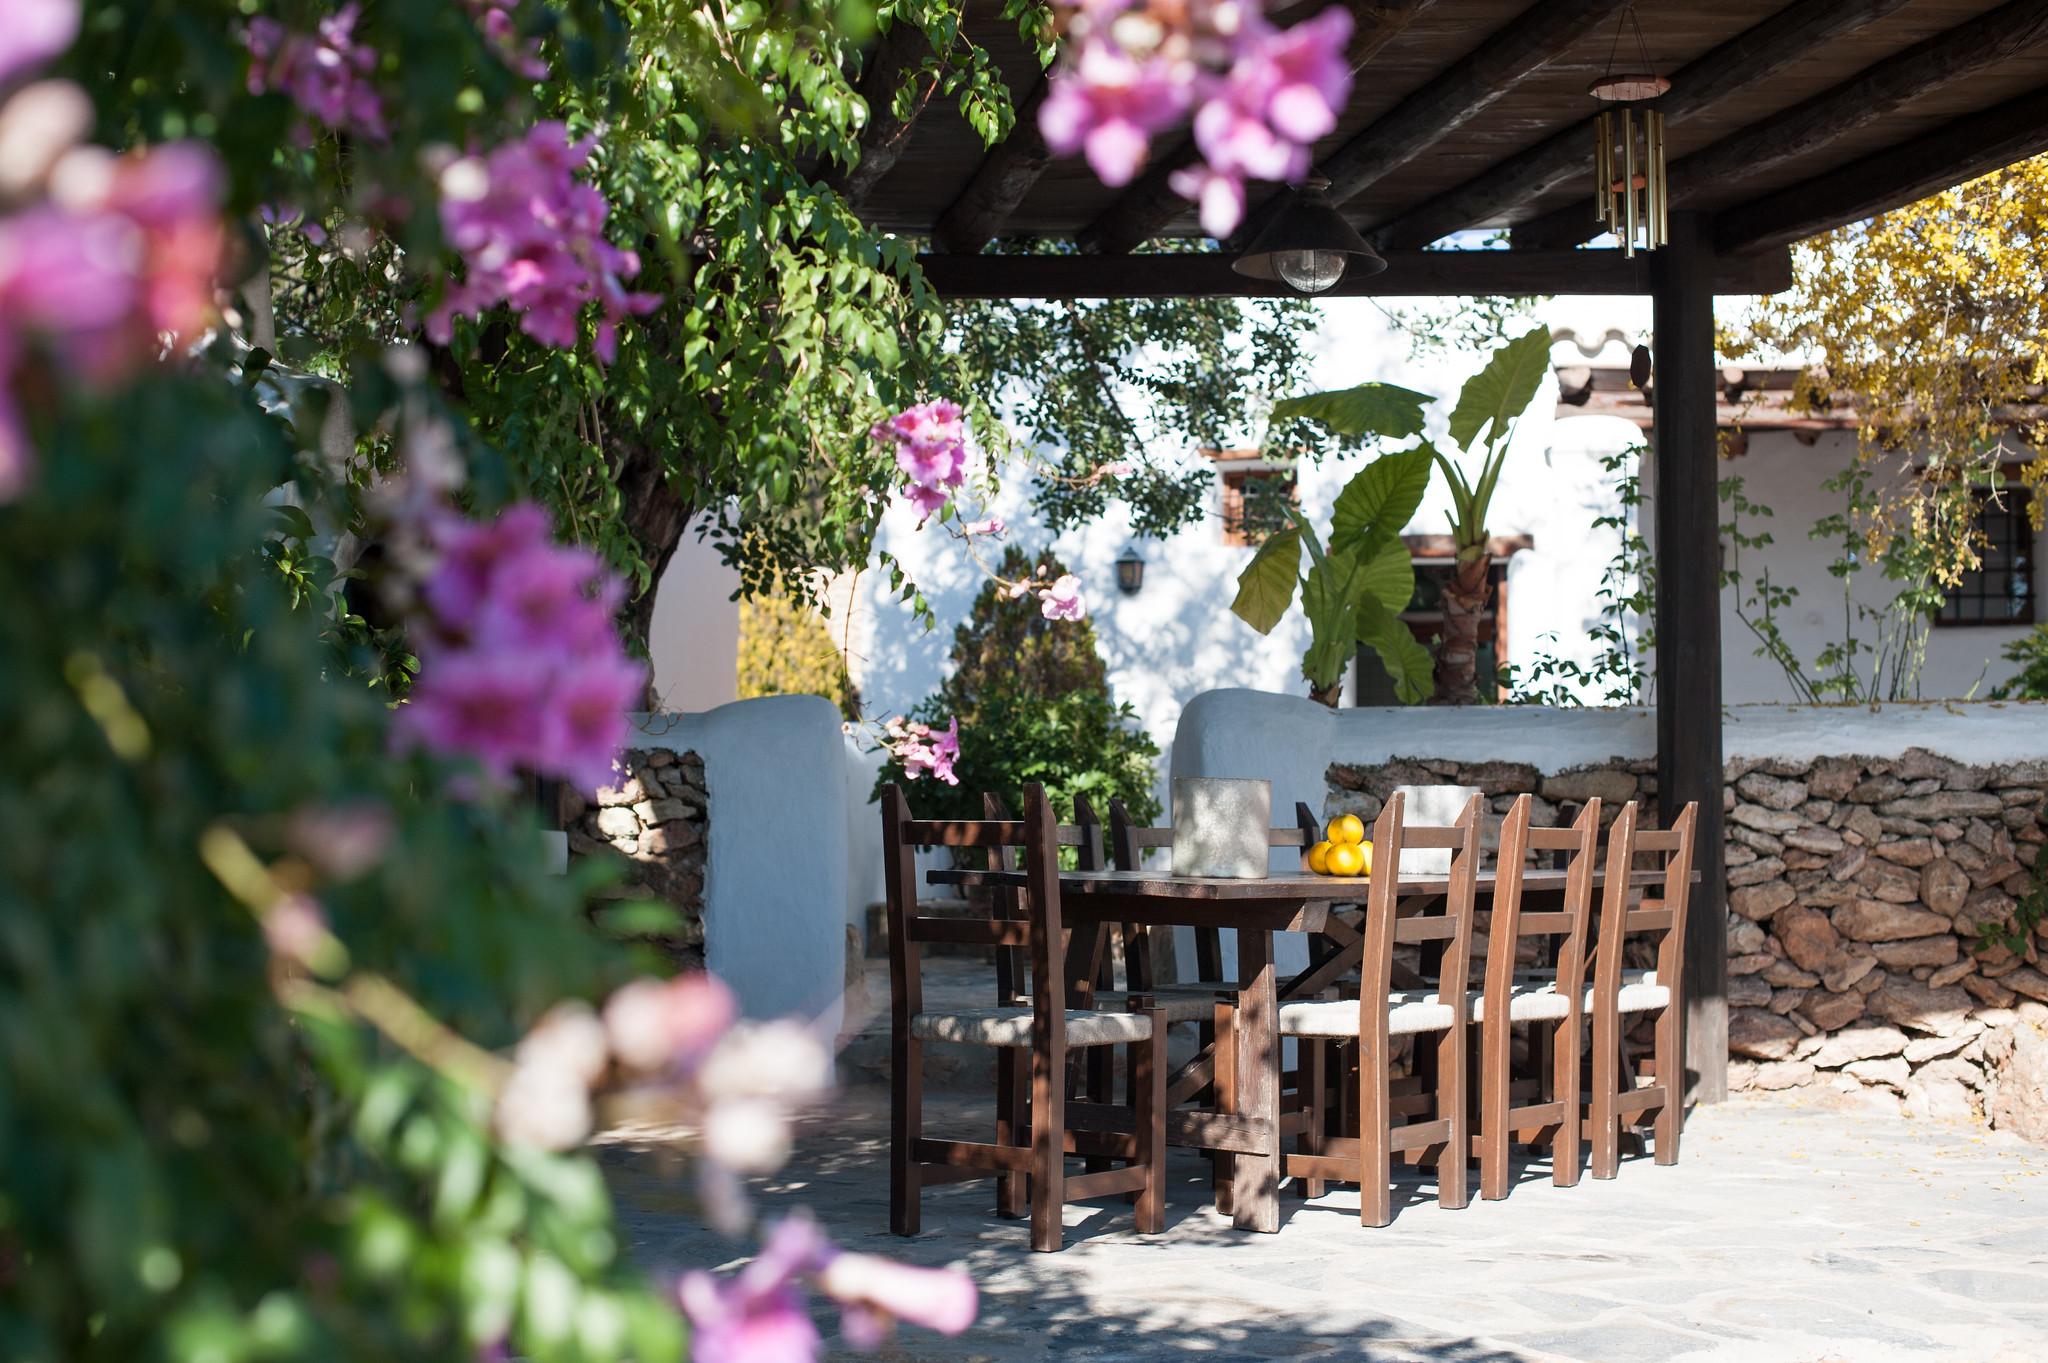 https://www.white-ibiza.com/wp-content/uploads/2020/05/white-ibiza-villas-canblay-outside-dining.jpg